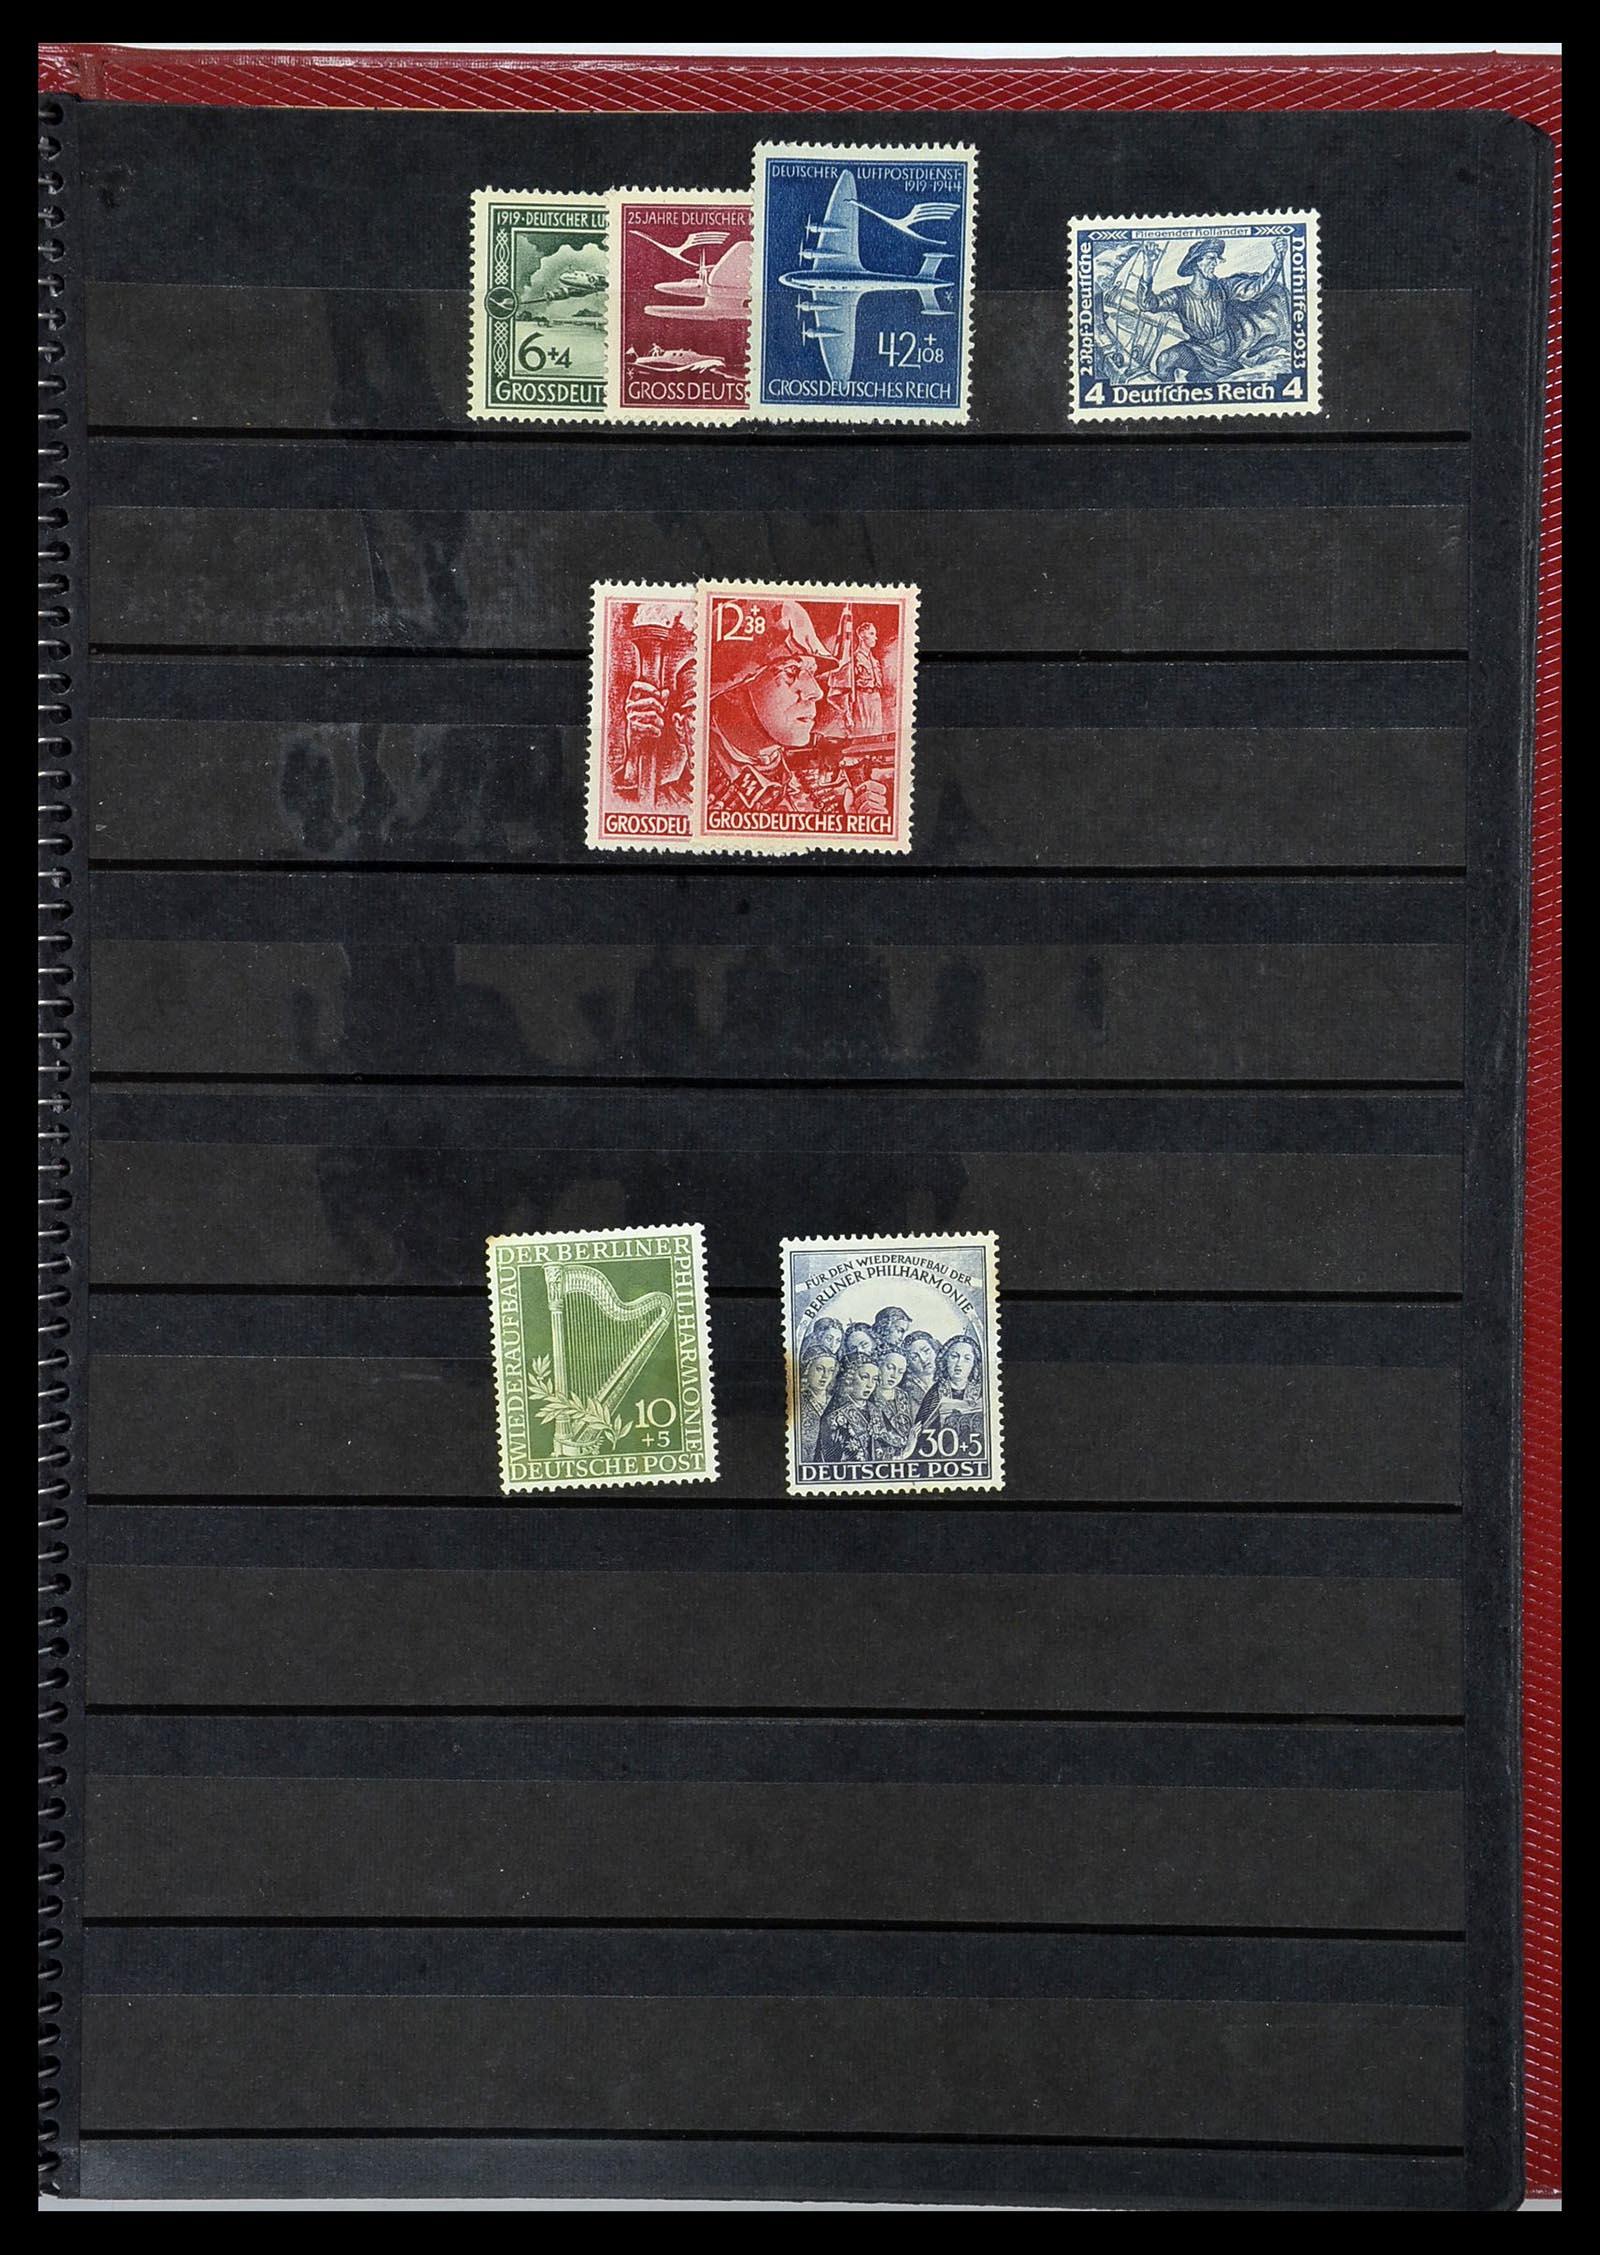 34169 007 - Postzegelverzameling 34169 Duitsland 1880-1955.